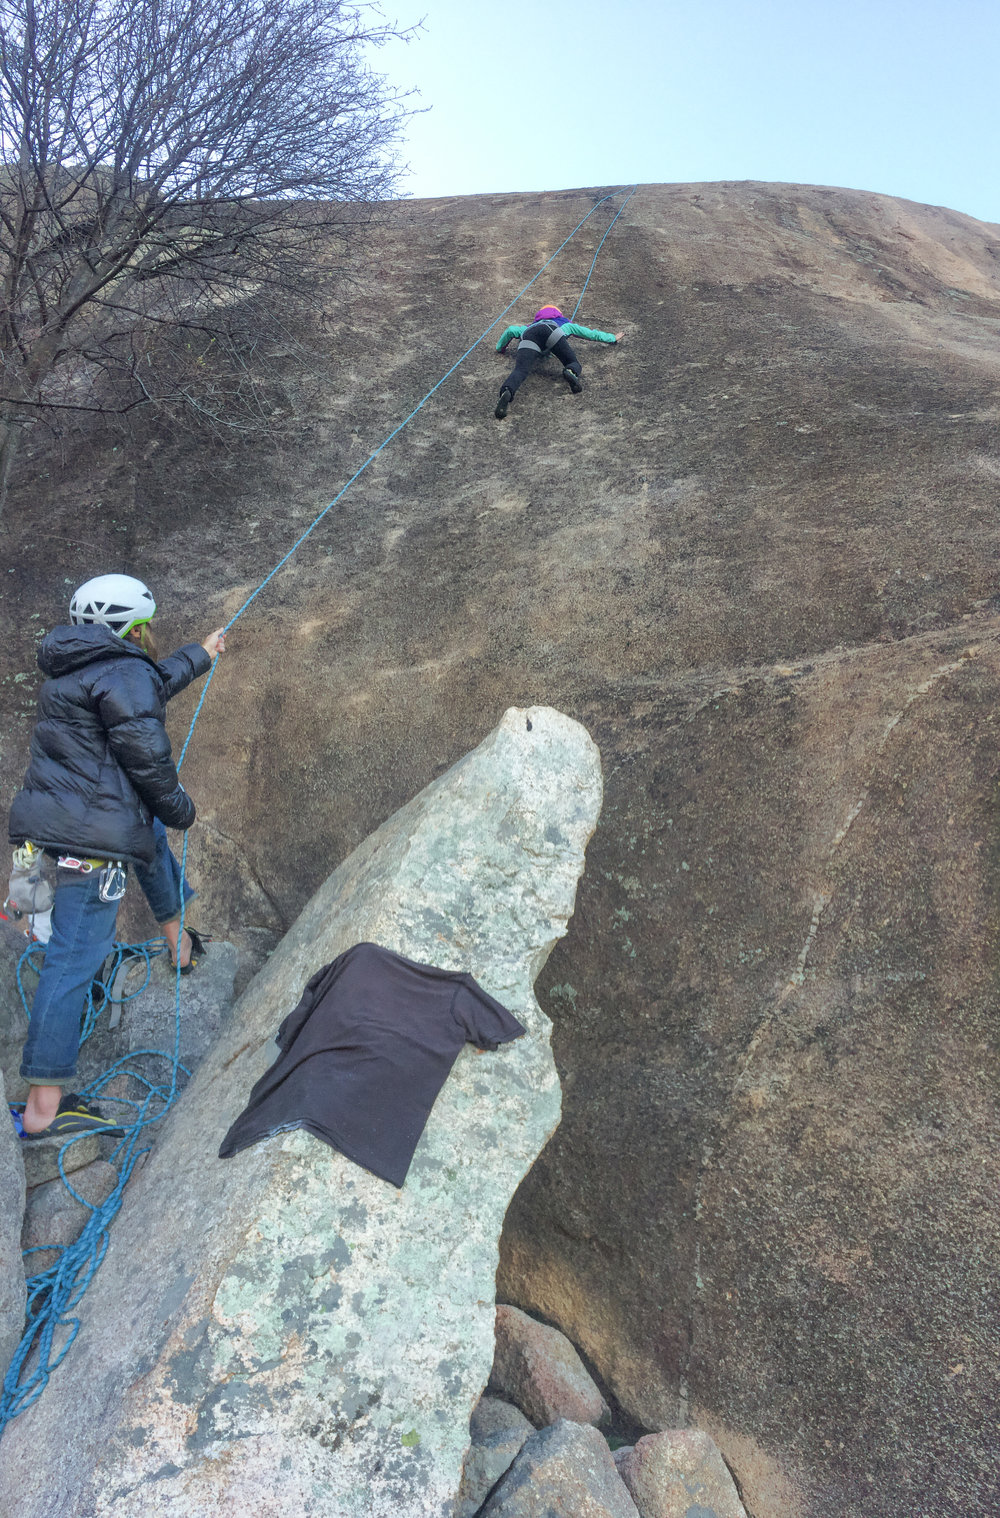 climbinginspain-1.jpg